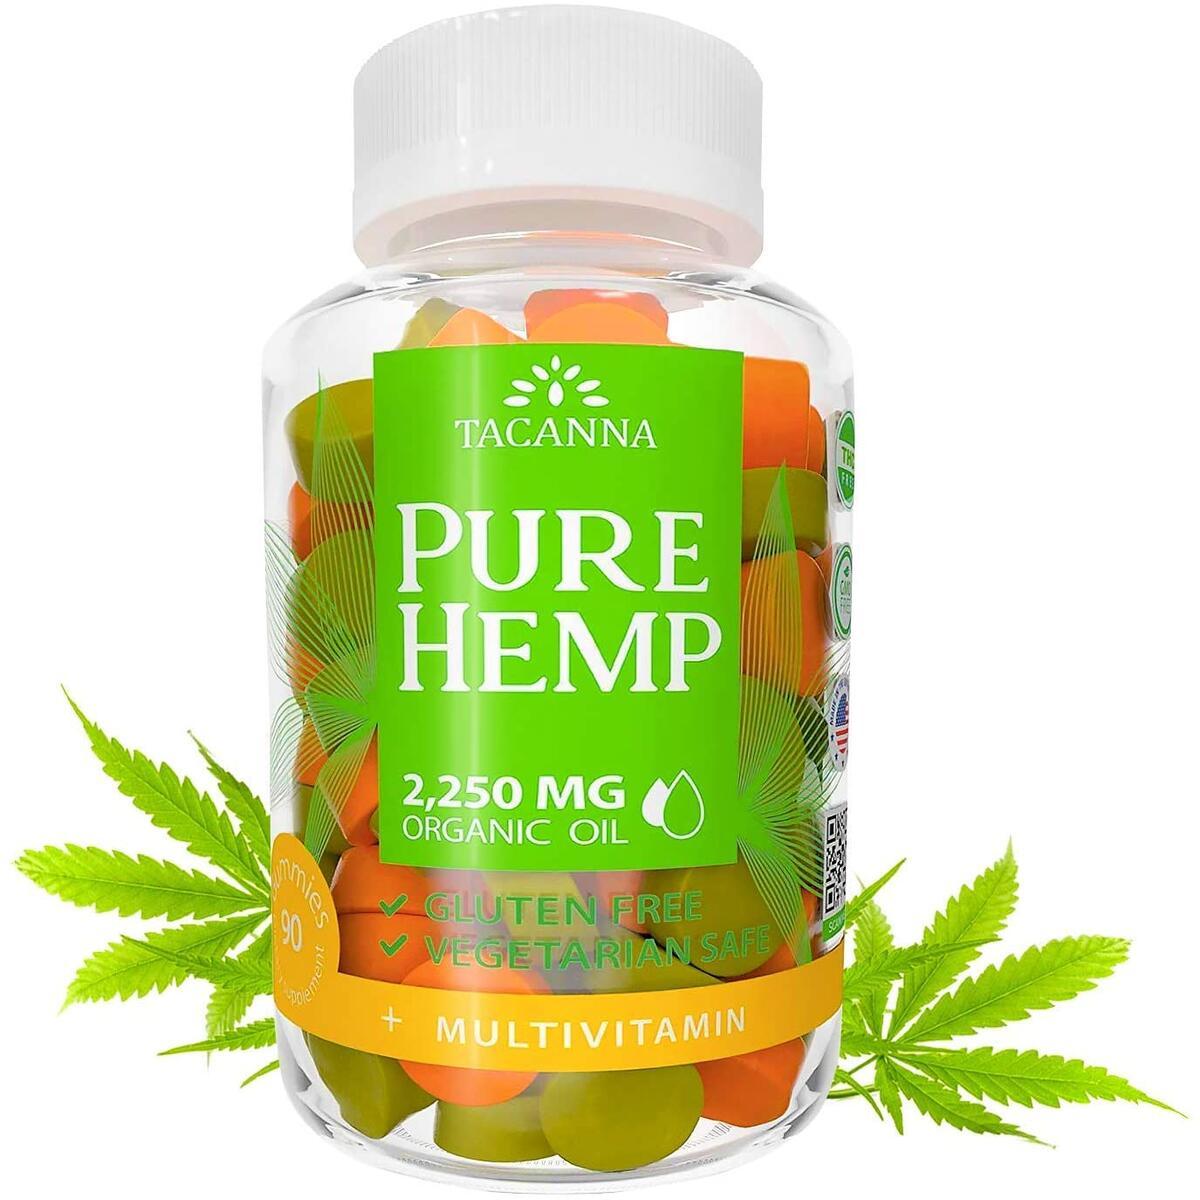 Tacanna Natural Hemp Gummies - Ultra Volume 4500Mg - 2 Bottles - 180pcs - Premium Hemp Extract - Relieve Stress, Pain and Anxiety -Brain Boost - Immune Support - Omega 3 6 9 Multivitamin